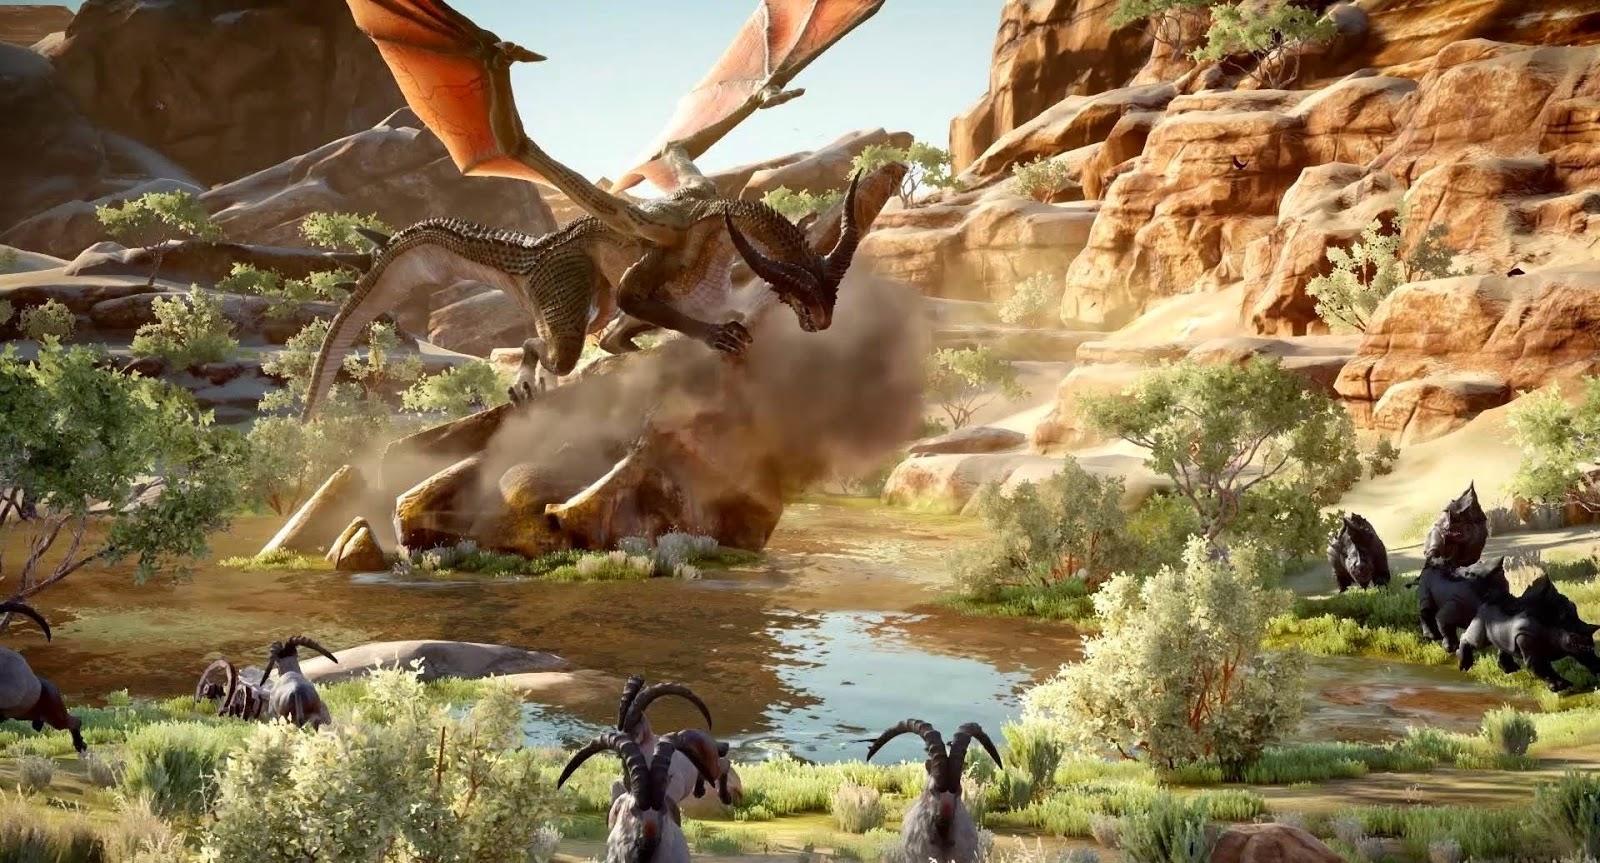 dragon age inquisition,dragon age inquisition dragons,dragons